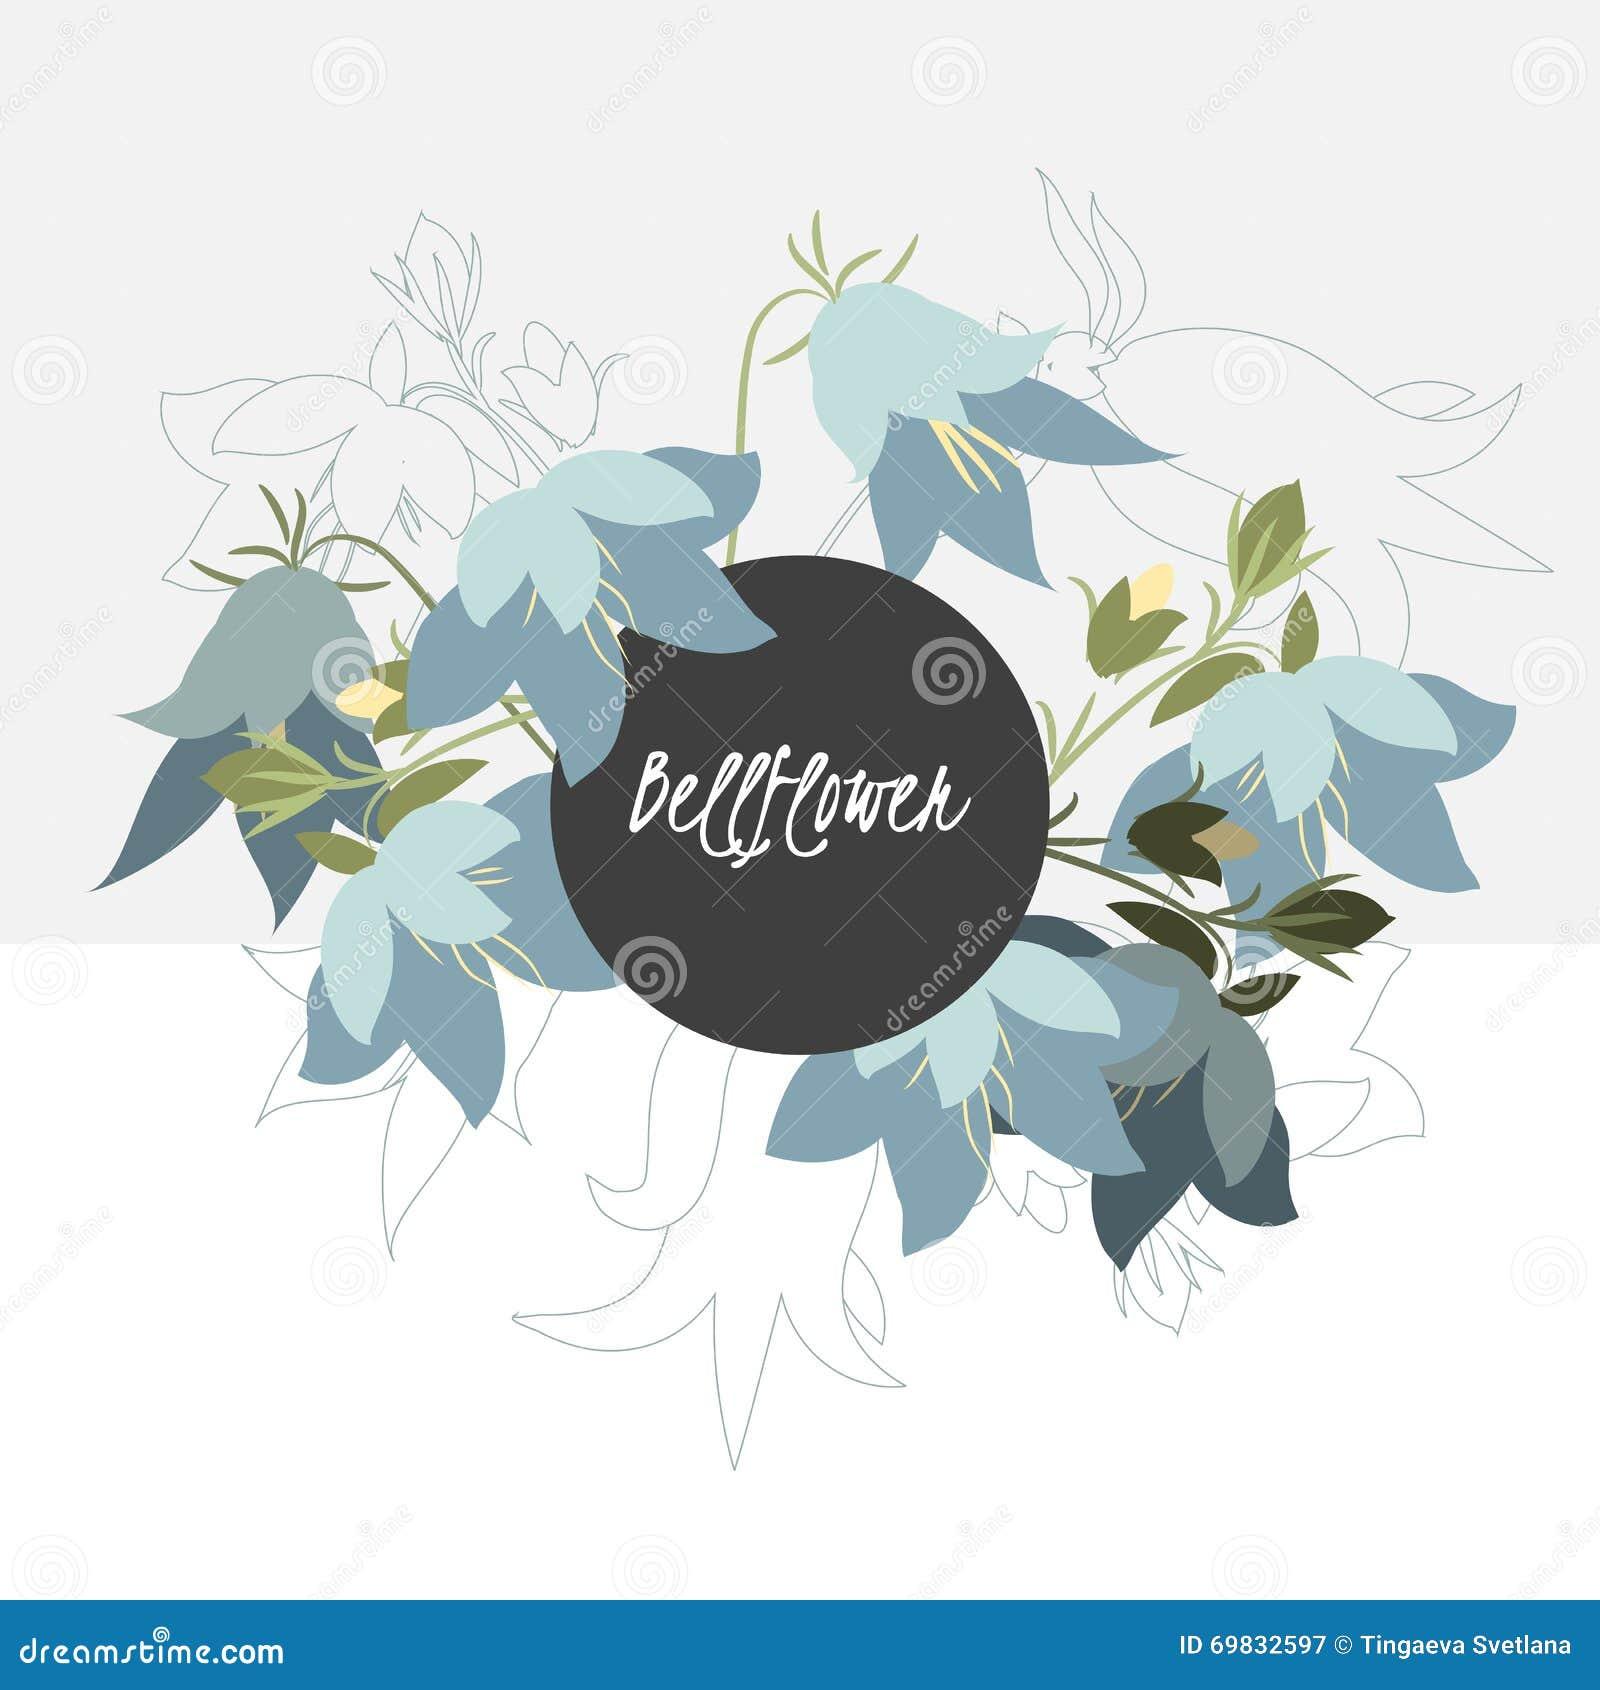 Greeting card bell flower